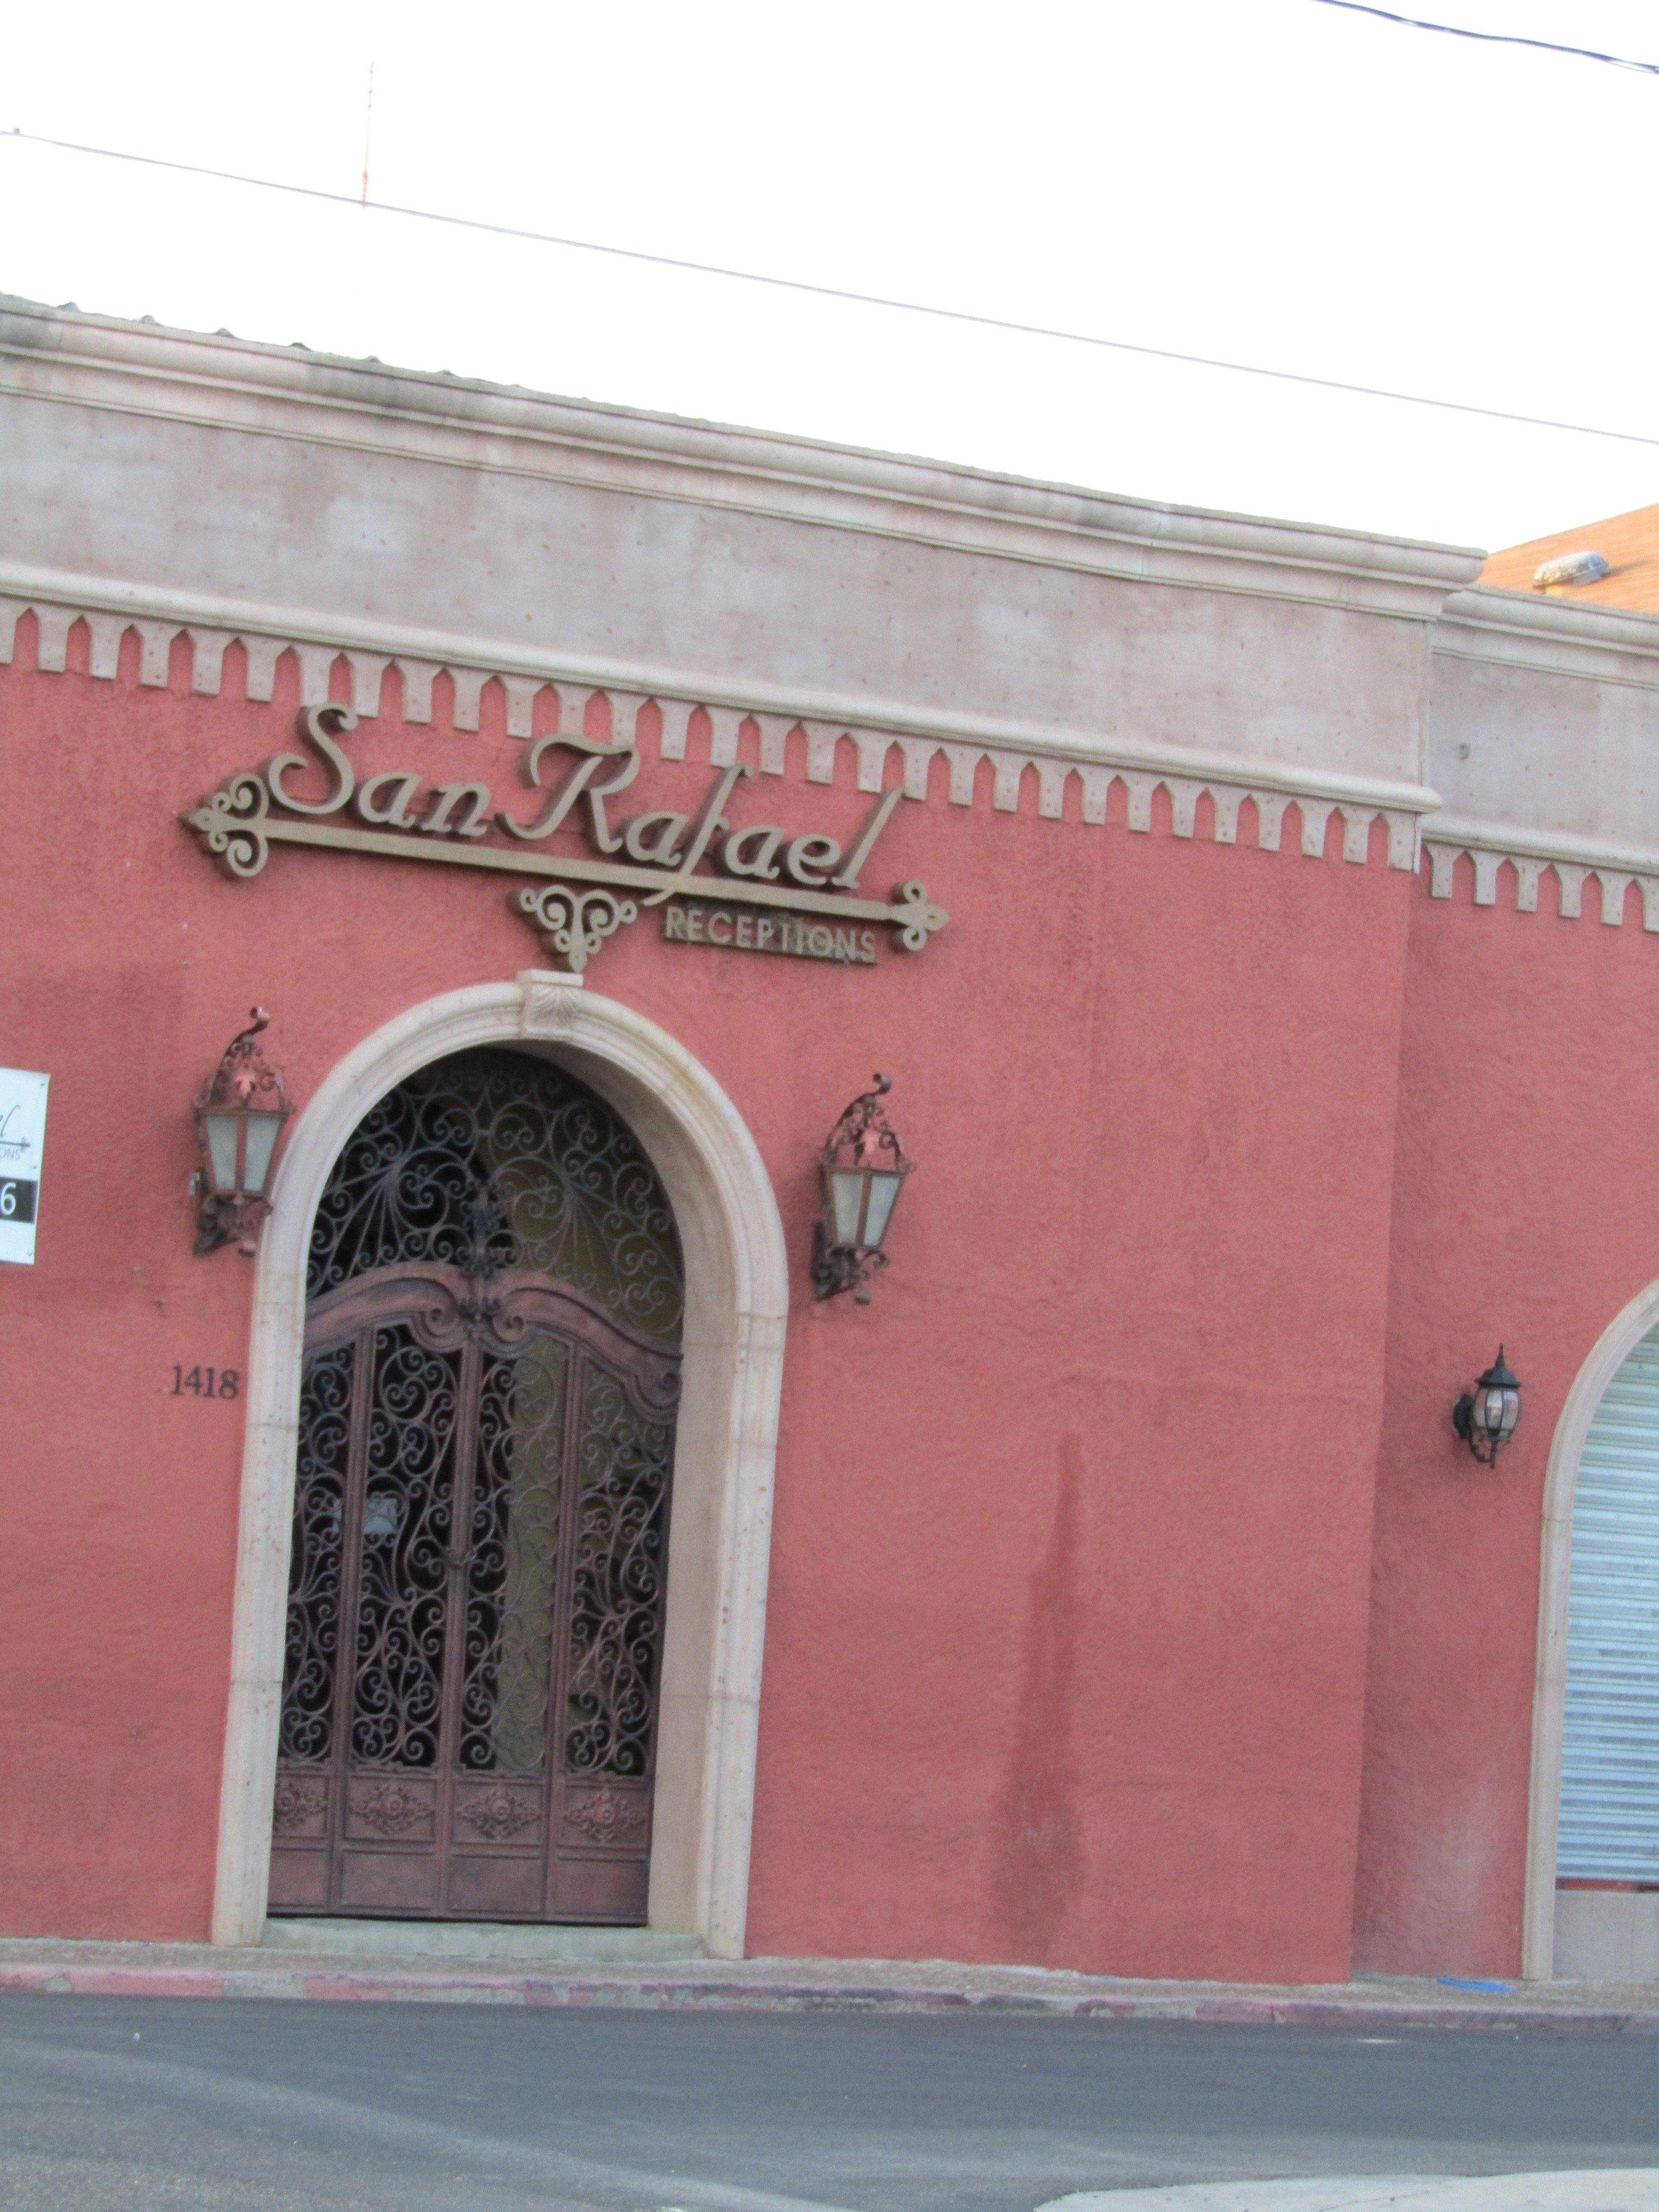 San Rafael Reception Hall In Downtown Laredo Laredo Texas South Texas Travel Laredo San Rafael Safe Cities